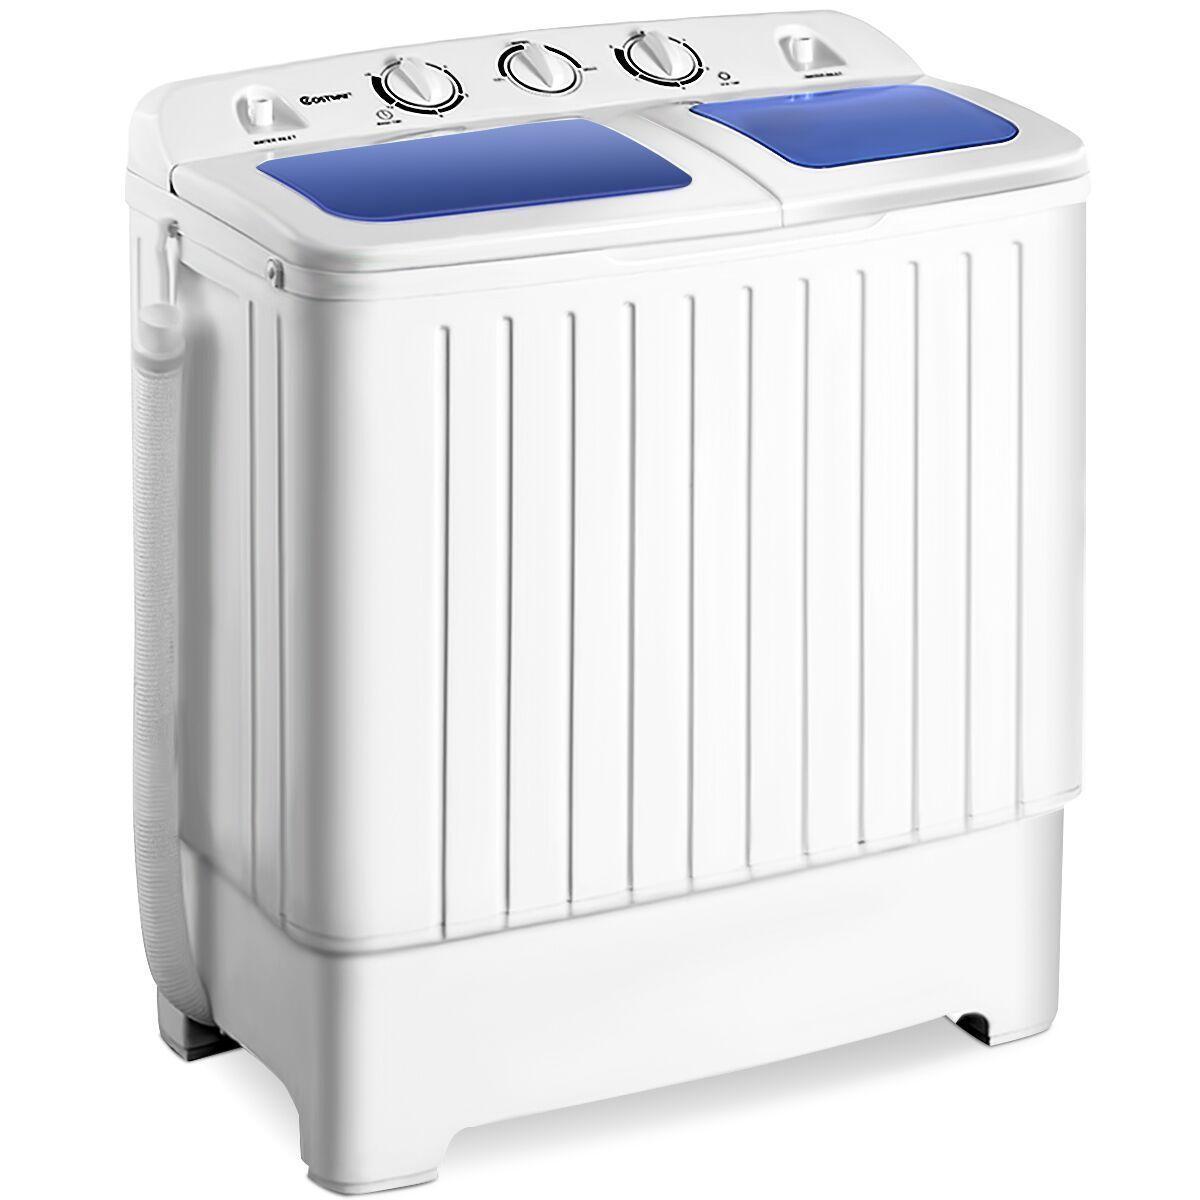 Camper Renovation Discover Home In 2020 Twin Tub Mini Washing Machine Small Washing Machine